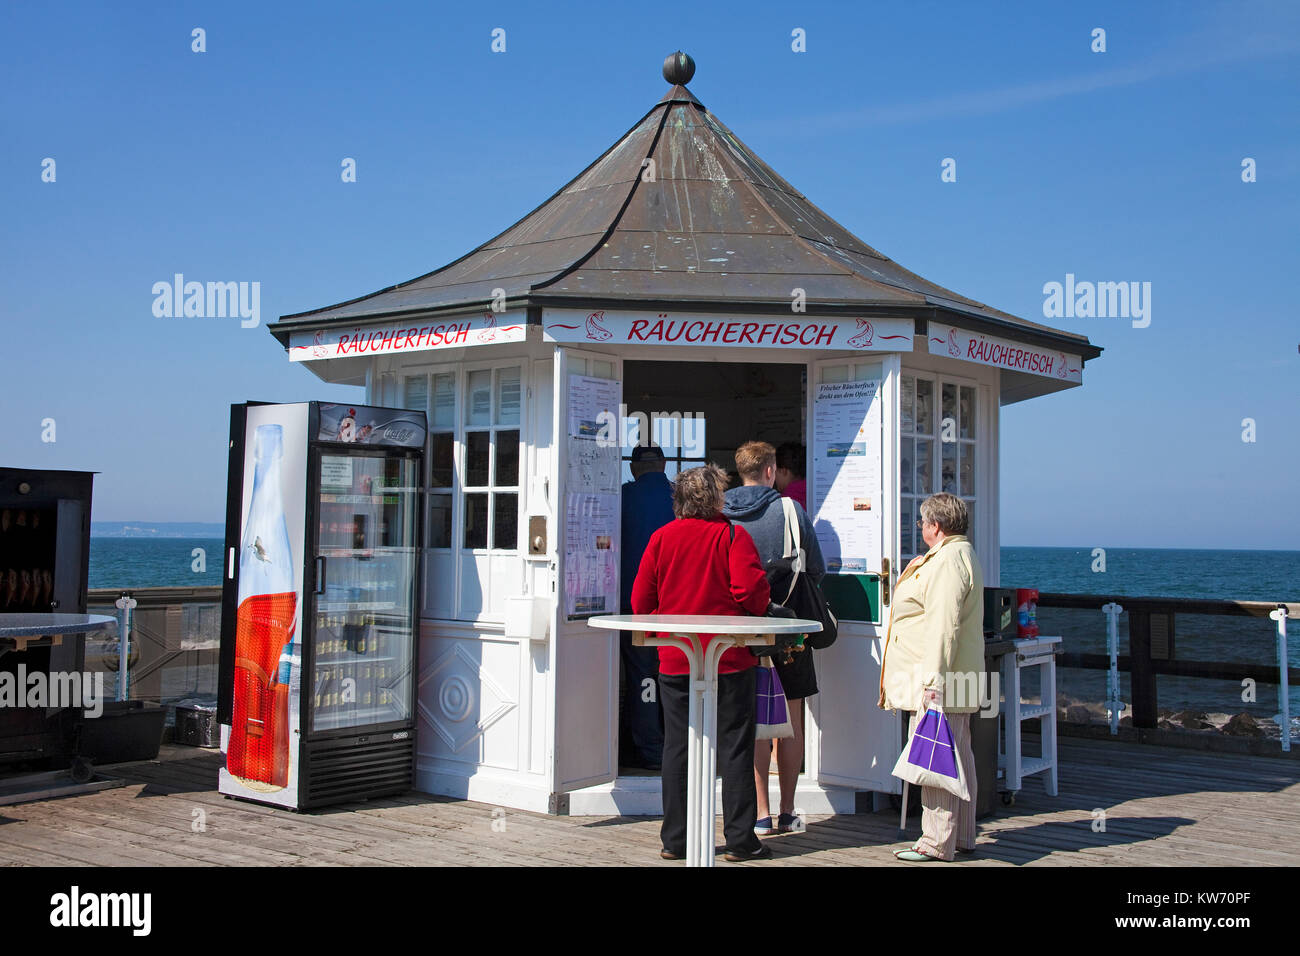 Kiosk, fish snacks on the Pier of Sellin, Ruegen island, Mecklenburg-Western Pomerania, Baltic Sea, Germany, Europe Stock Photo